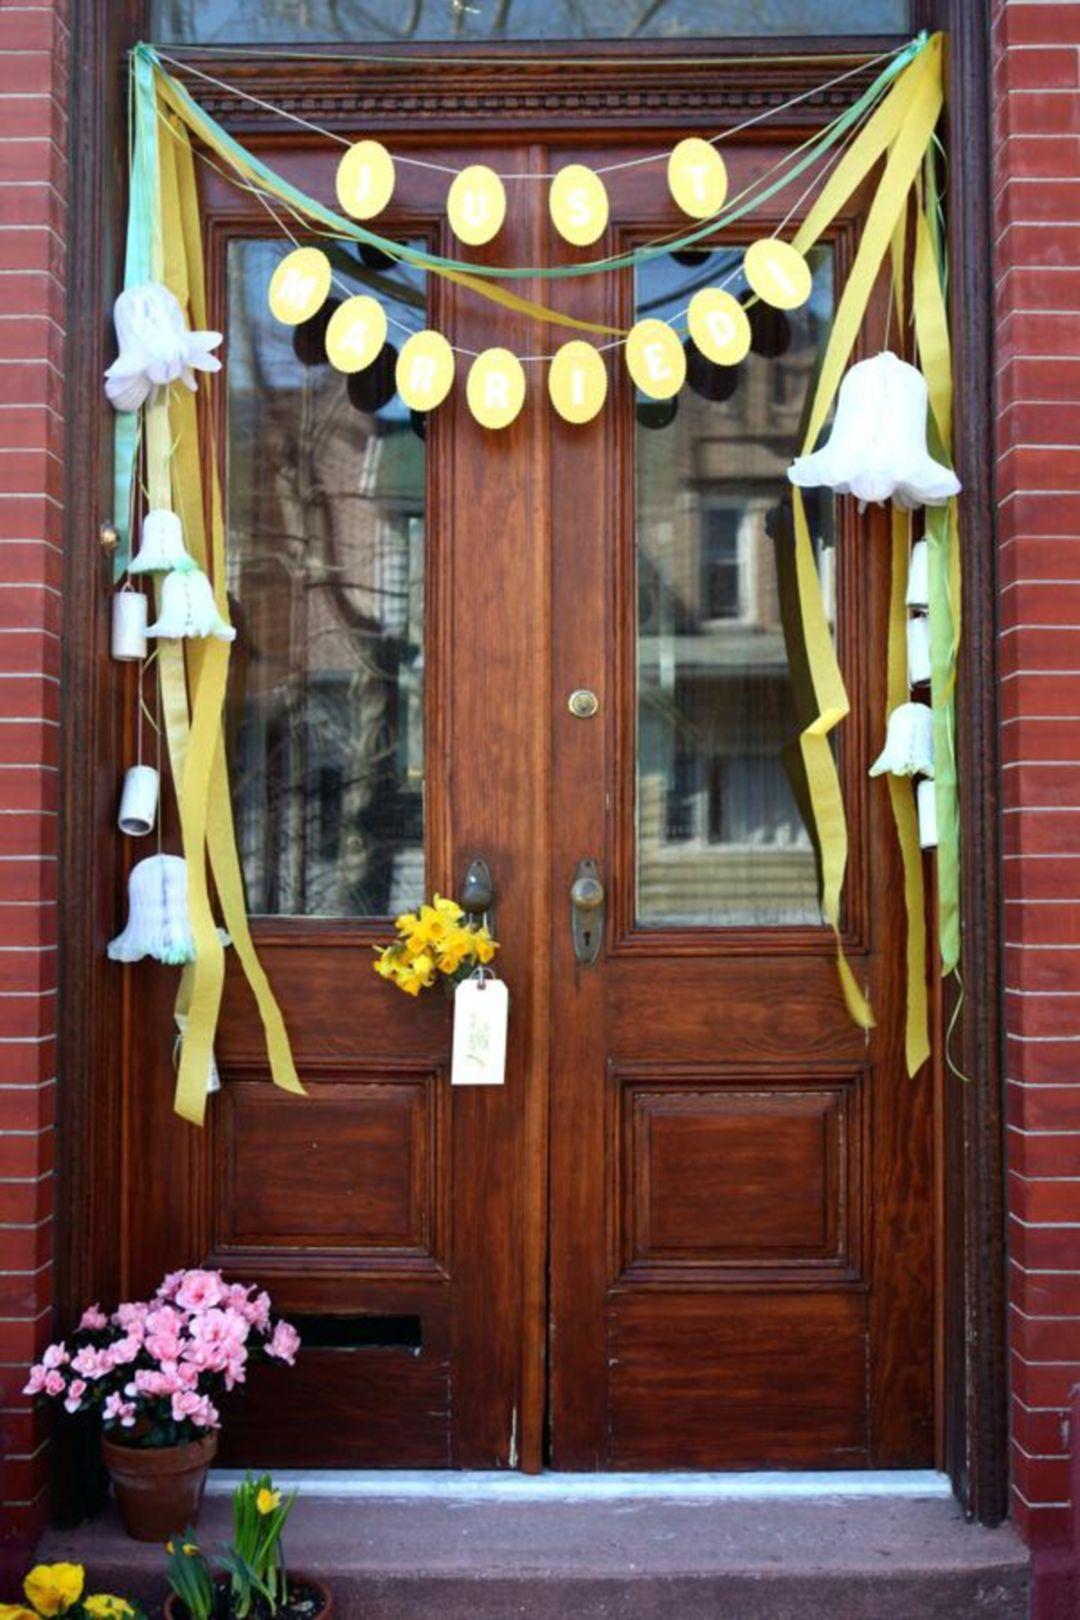 25 Super Cute DIY Door Decorations That Make Your Home